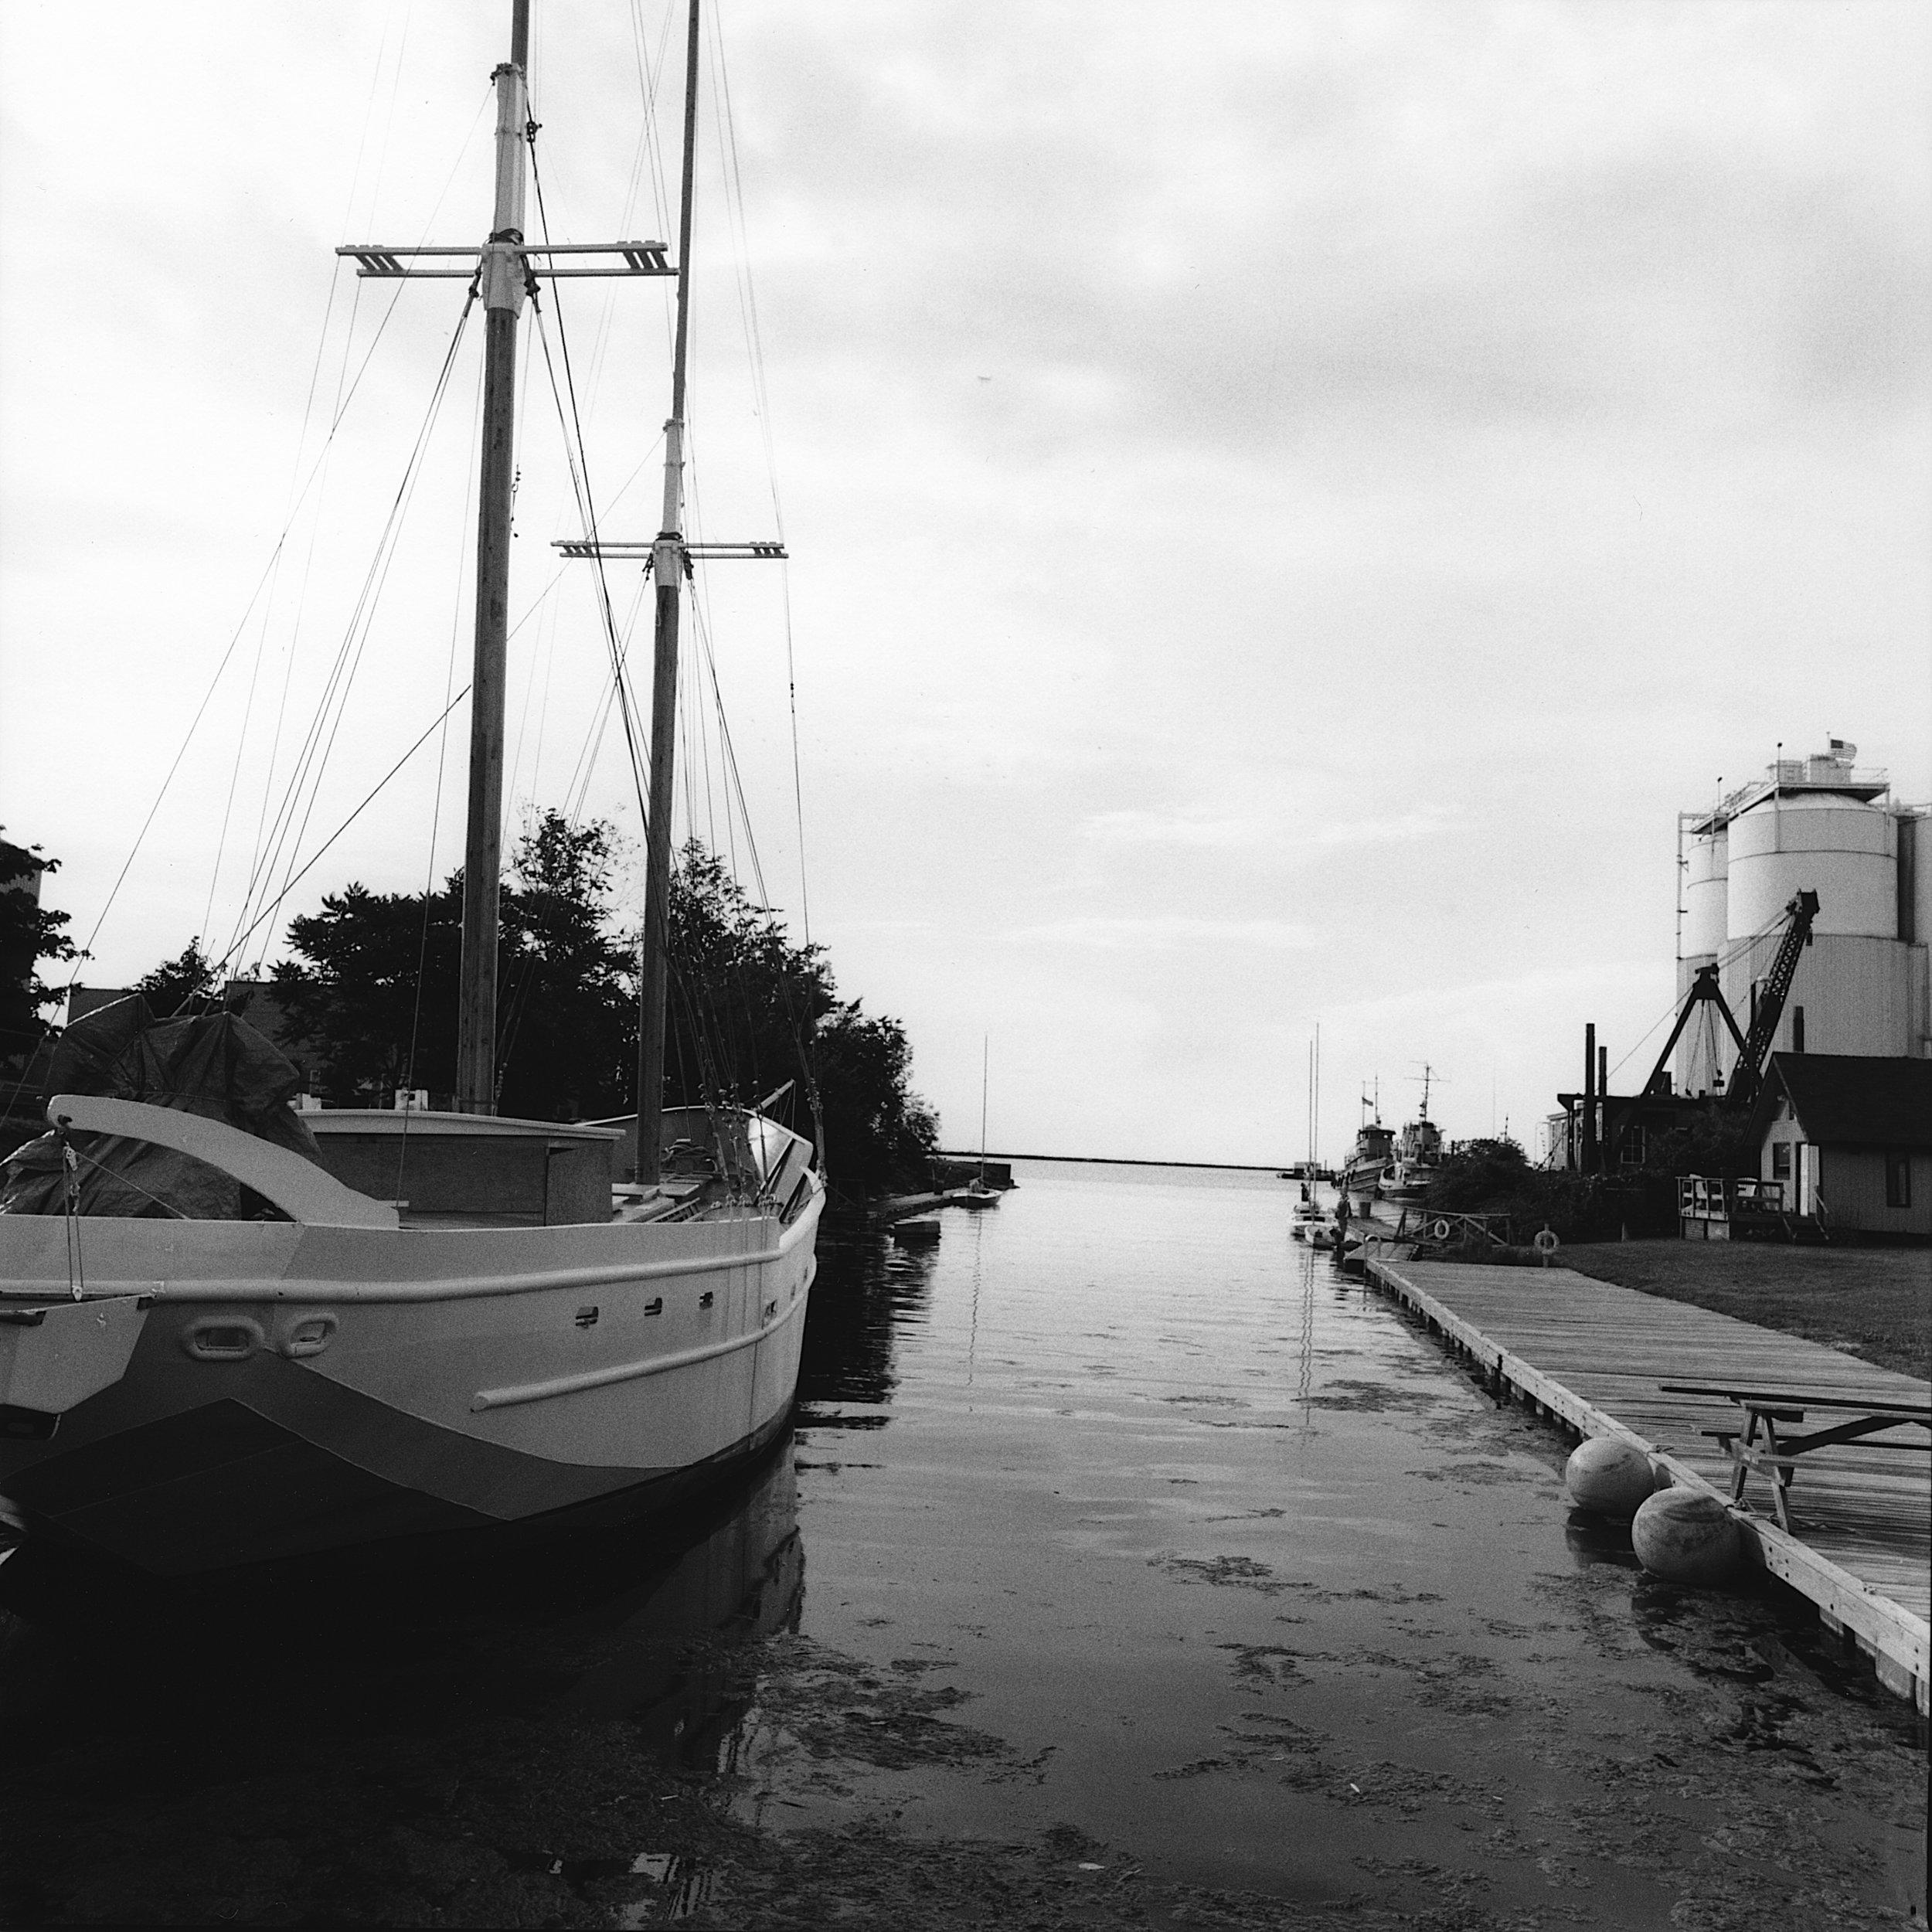 Oswego Harbor, New York 2003